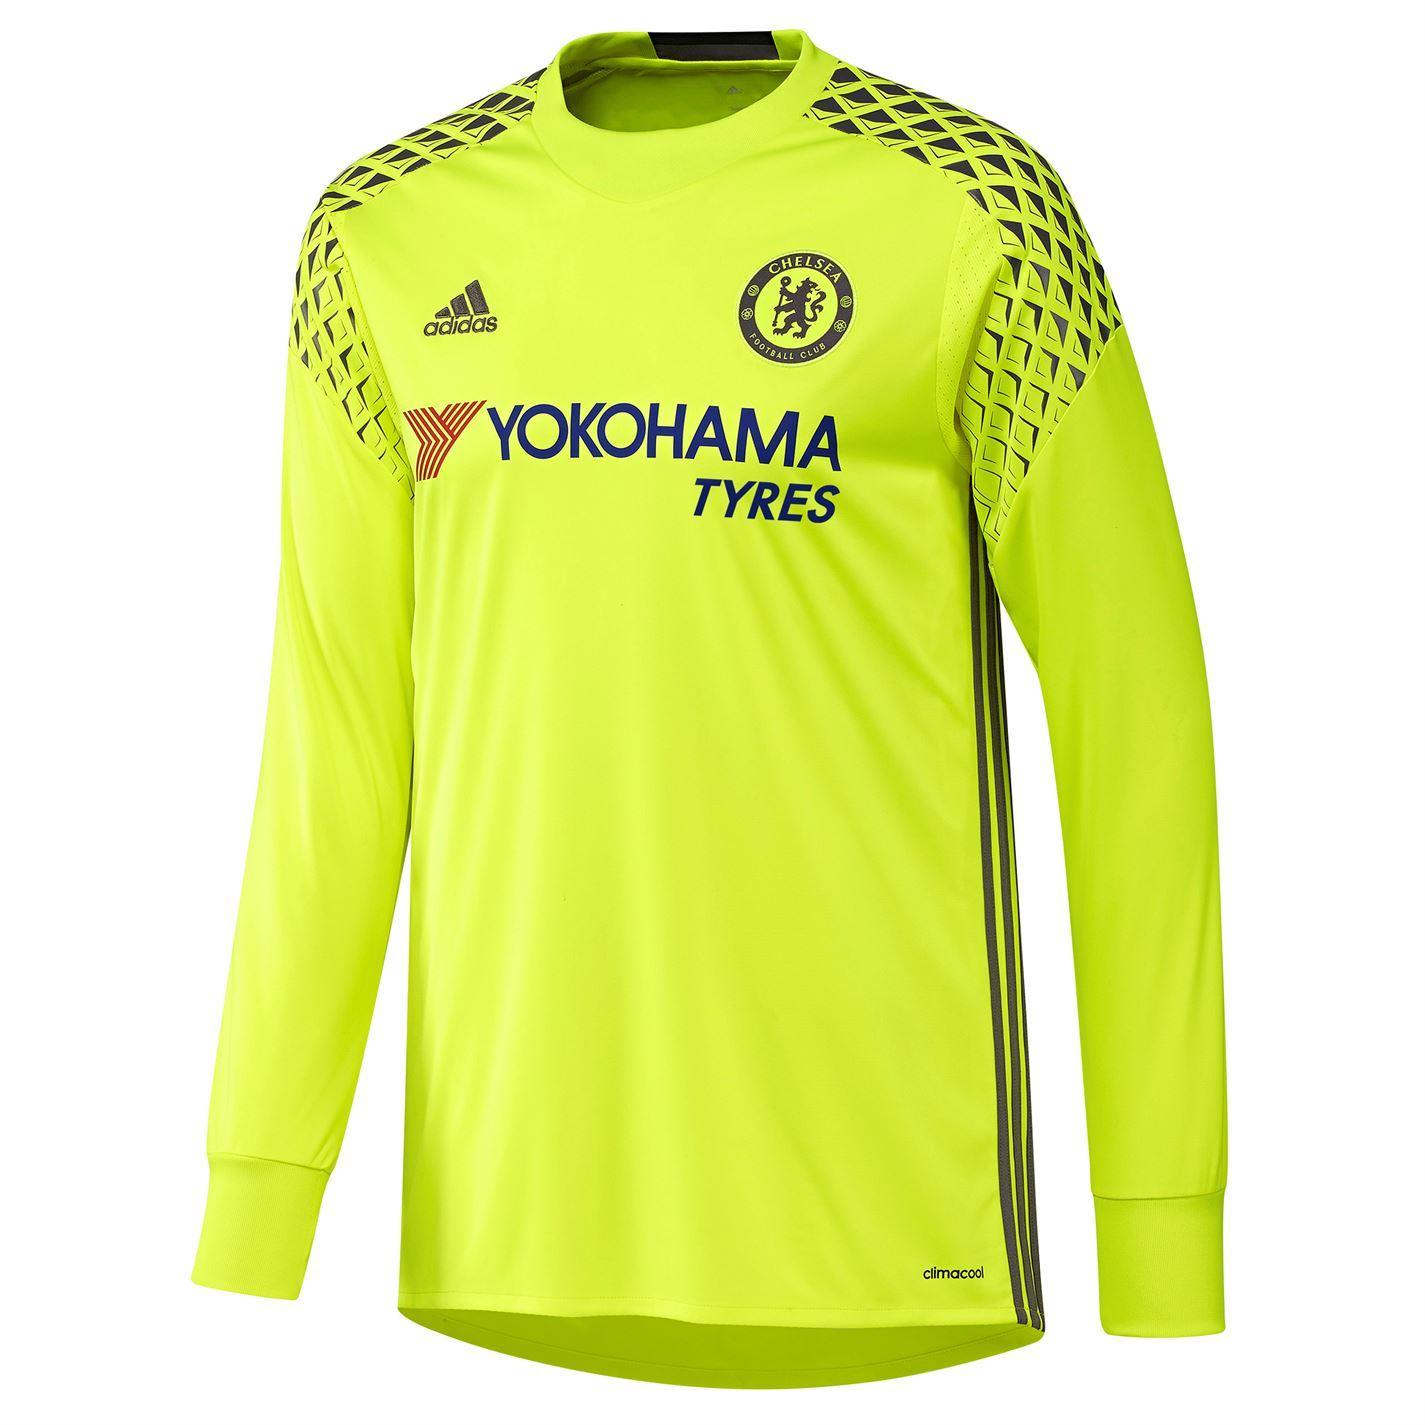 403e37b4833 ... Adidas Chelsea FC Home Goalkeeper Jersey 2016 2017 Mens Yellow Football  Soccer